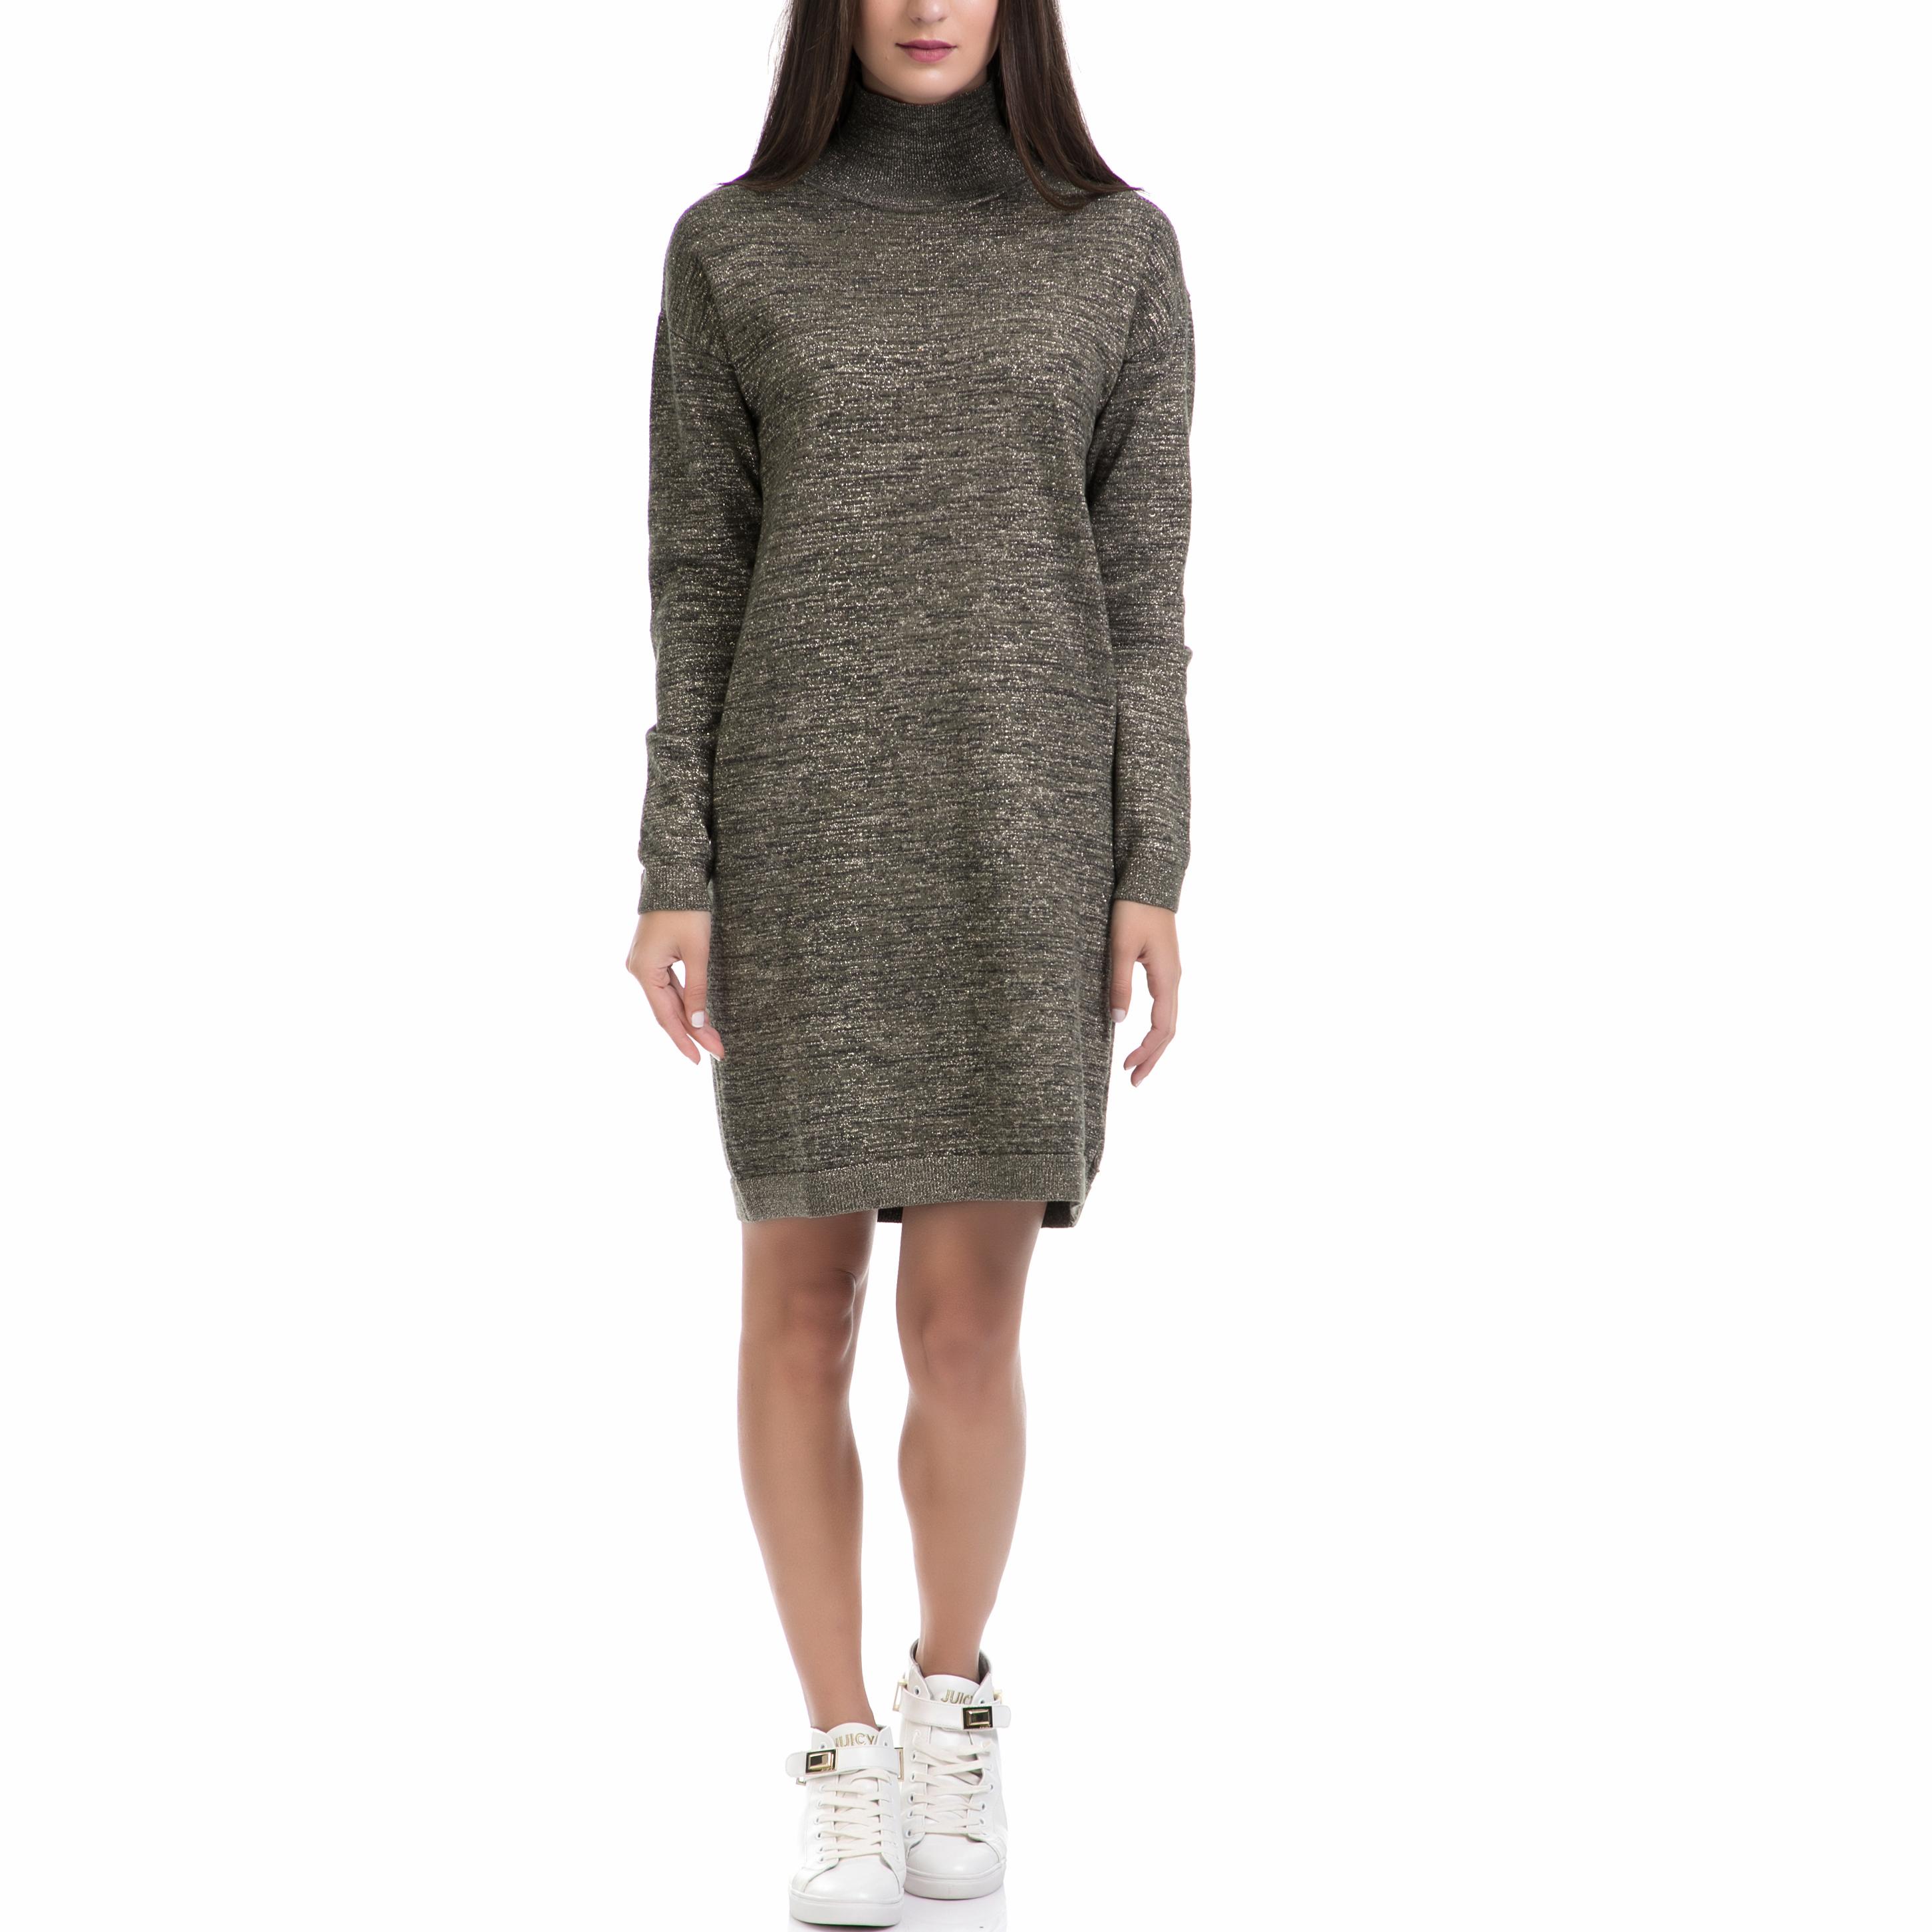 SCOTCH & SODA - Γυναικείο φόρεμα MAISON SCOTCH λαδί γυναικεία ρούχα φορέματα μίνι